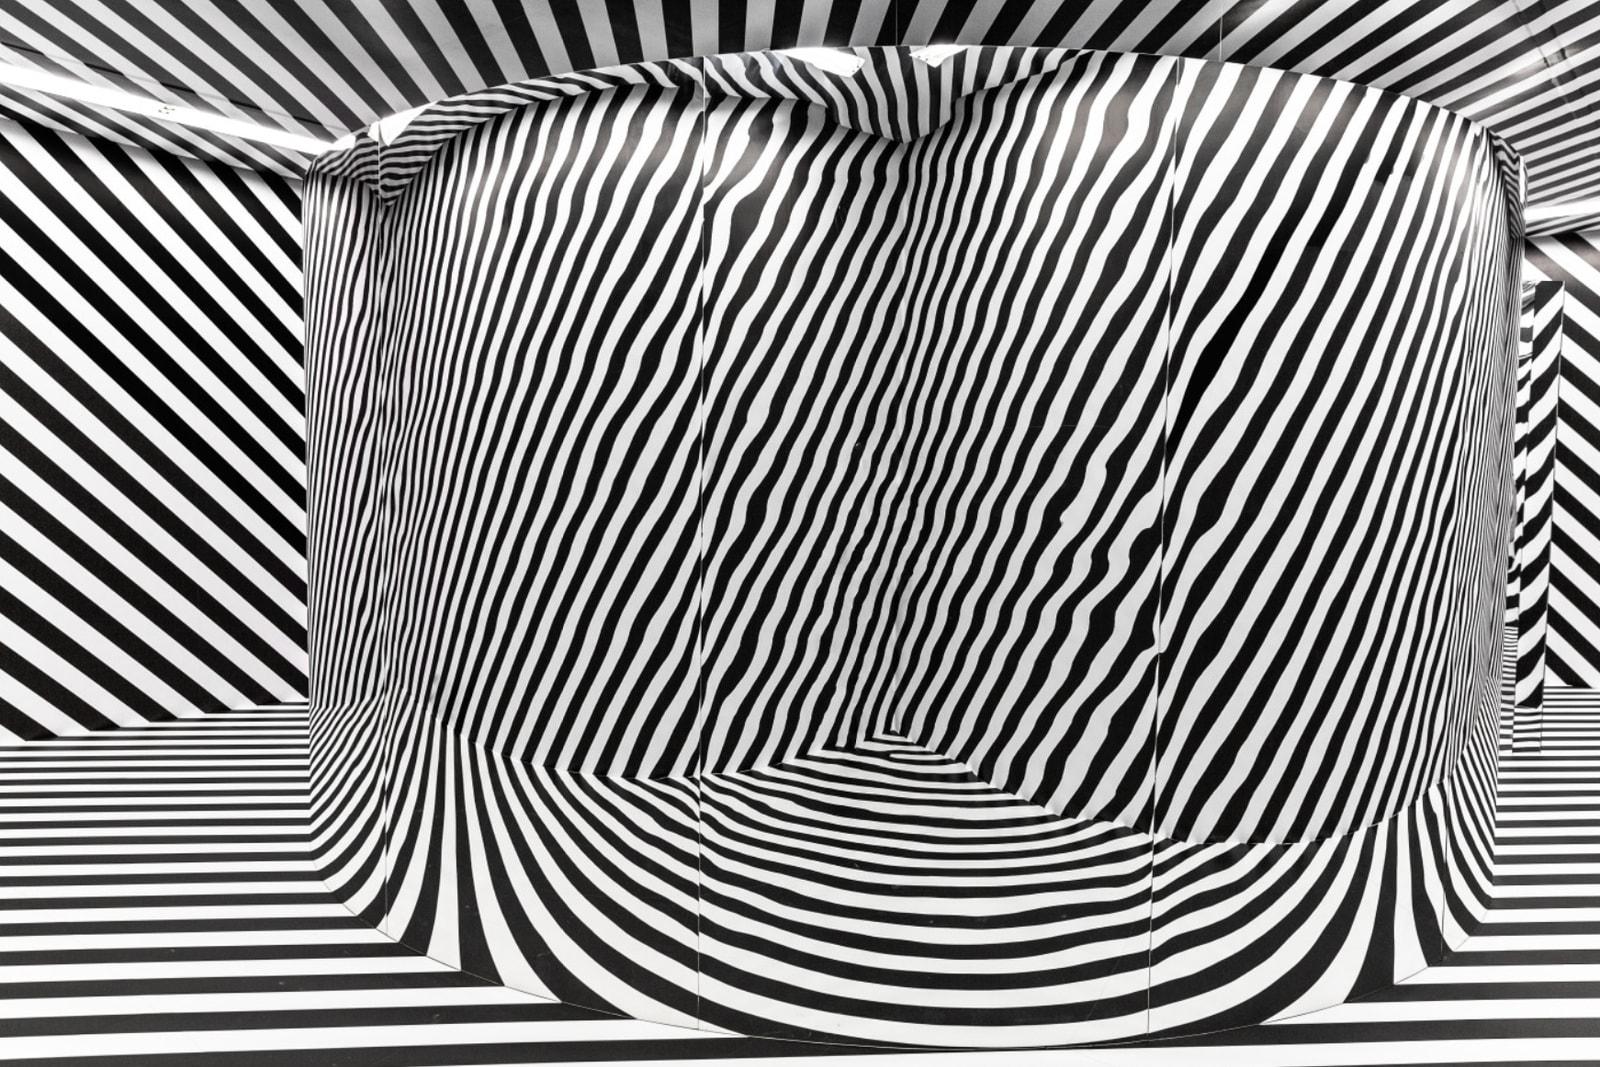 What To Do During Art Basel Hong Kong 2019 art show exhibition takashi murakami mr. daniel arsham perrotin Hiroshi Fujiwara Hans Ulrich Obrist kevin ma moncler kaws nigo sothetbys julio le parc